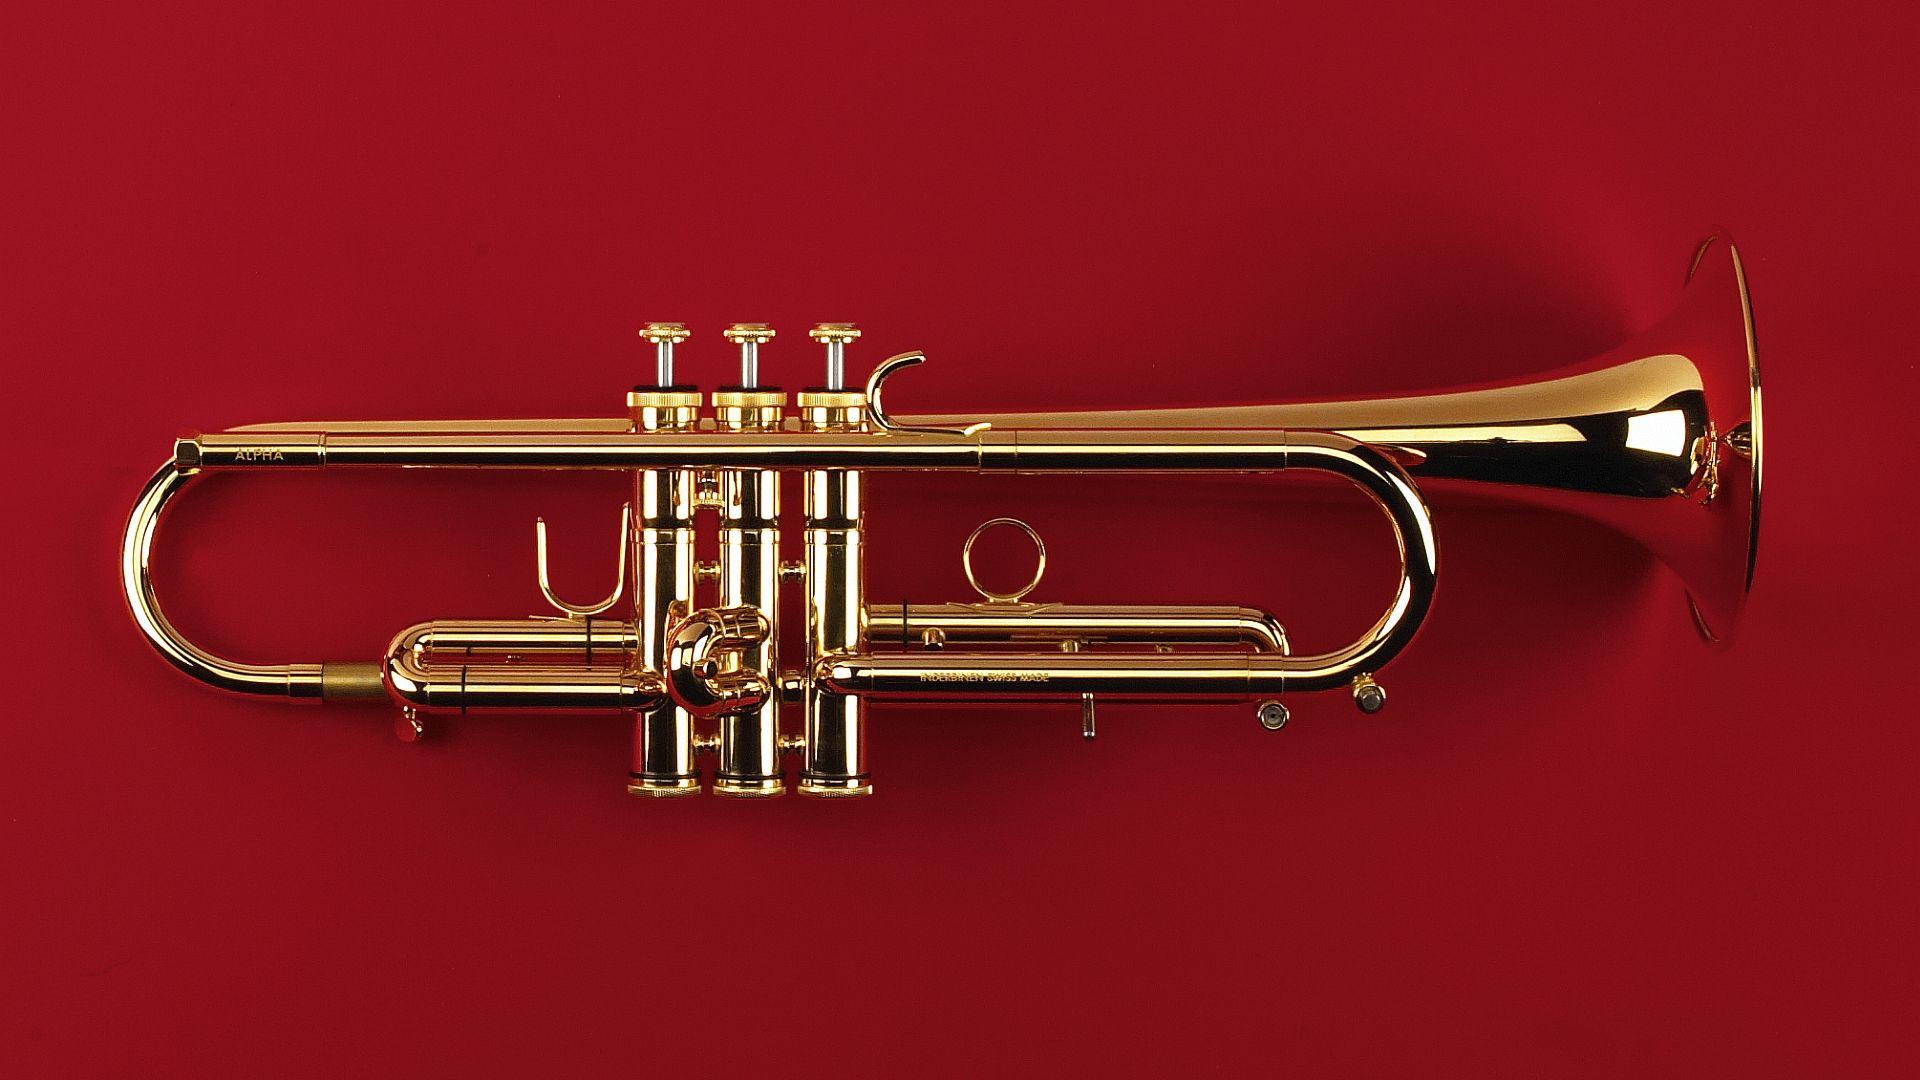 trompete_morrison_1920x1080px